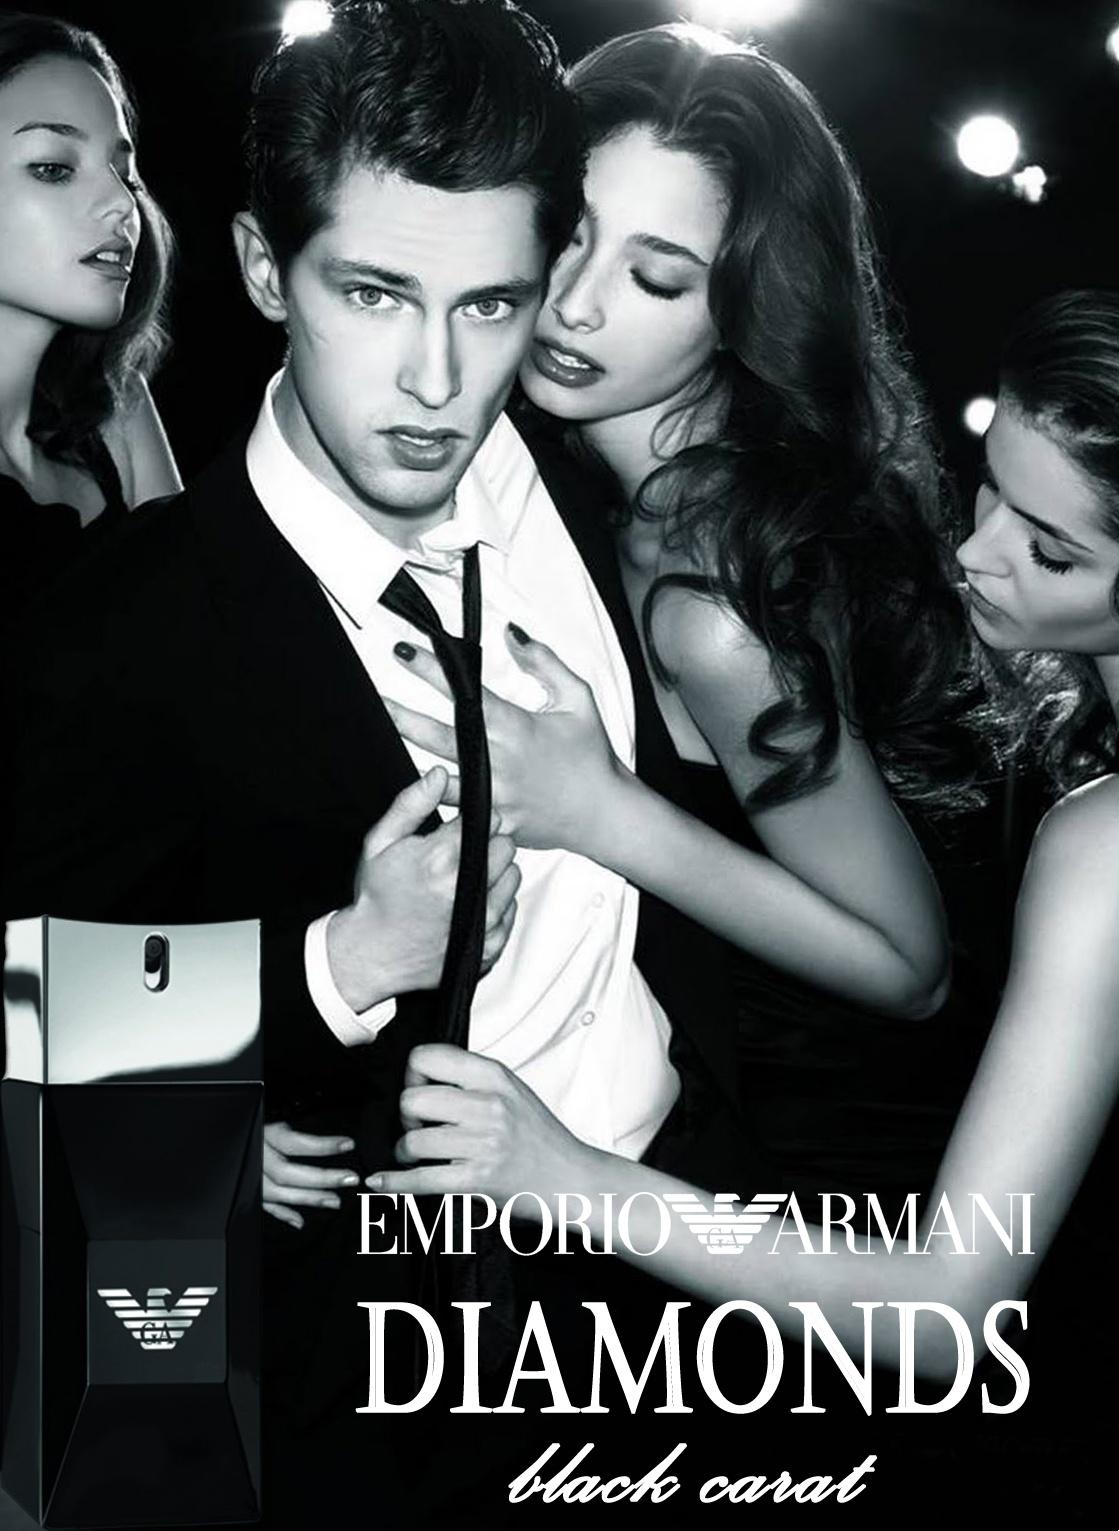 Fig. 13 - Emporio Armani Ad (2012)